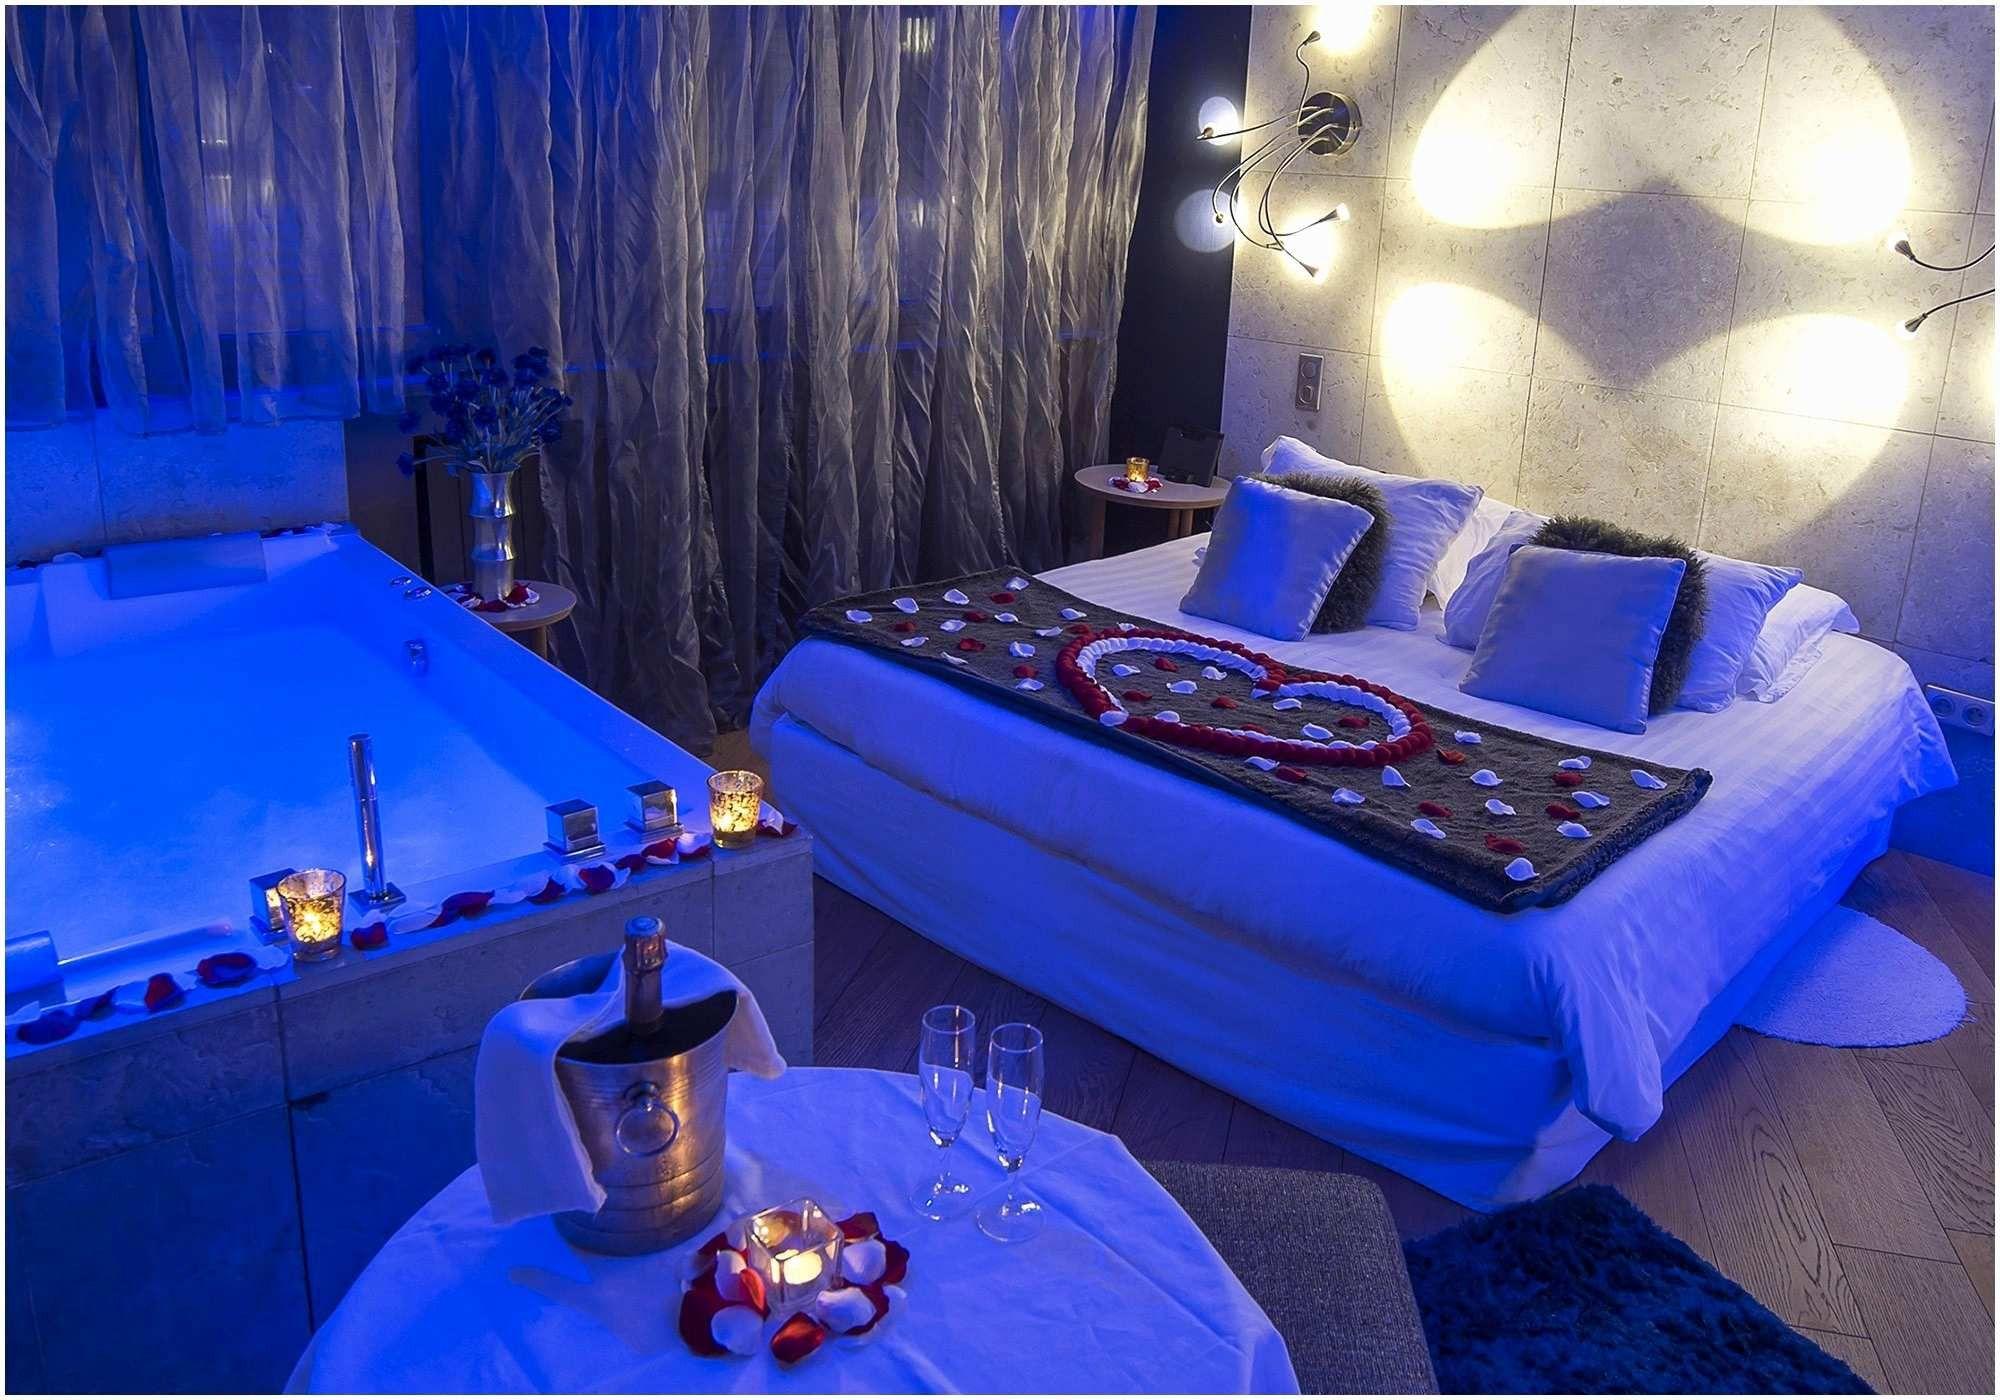 Lovely Hotel Spa Jacuzzi Privatif Paris Jacuzzi Spas Jacuzzi Hotel Spa